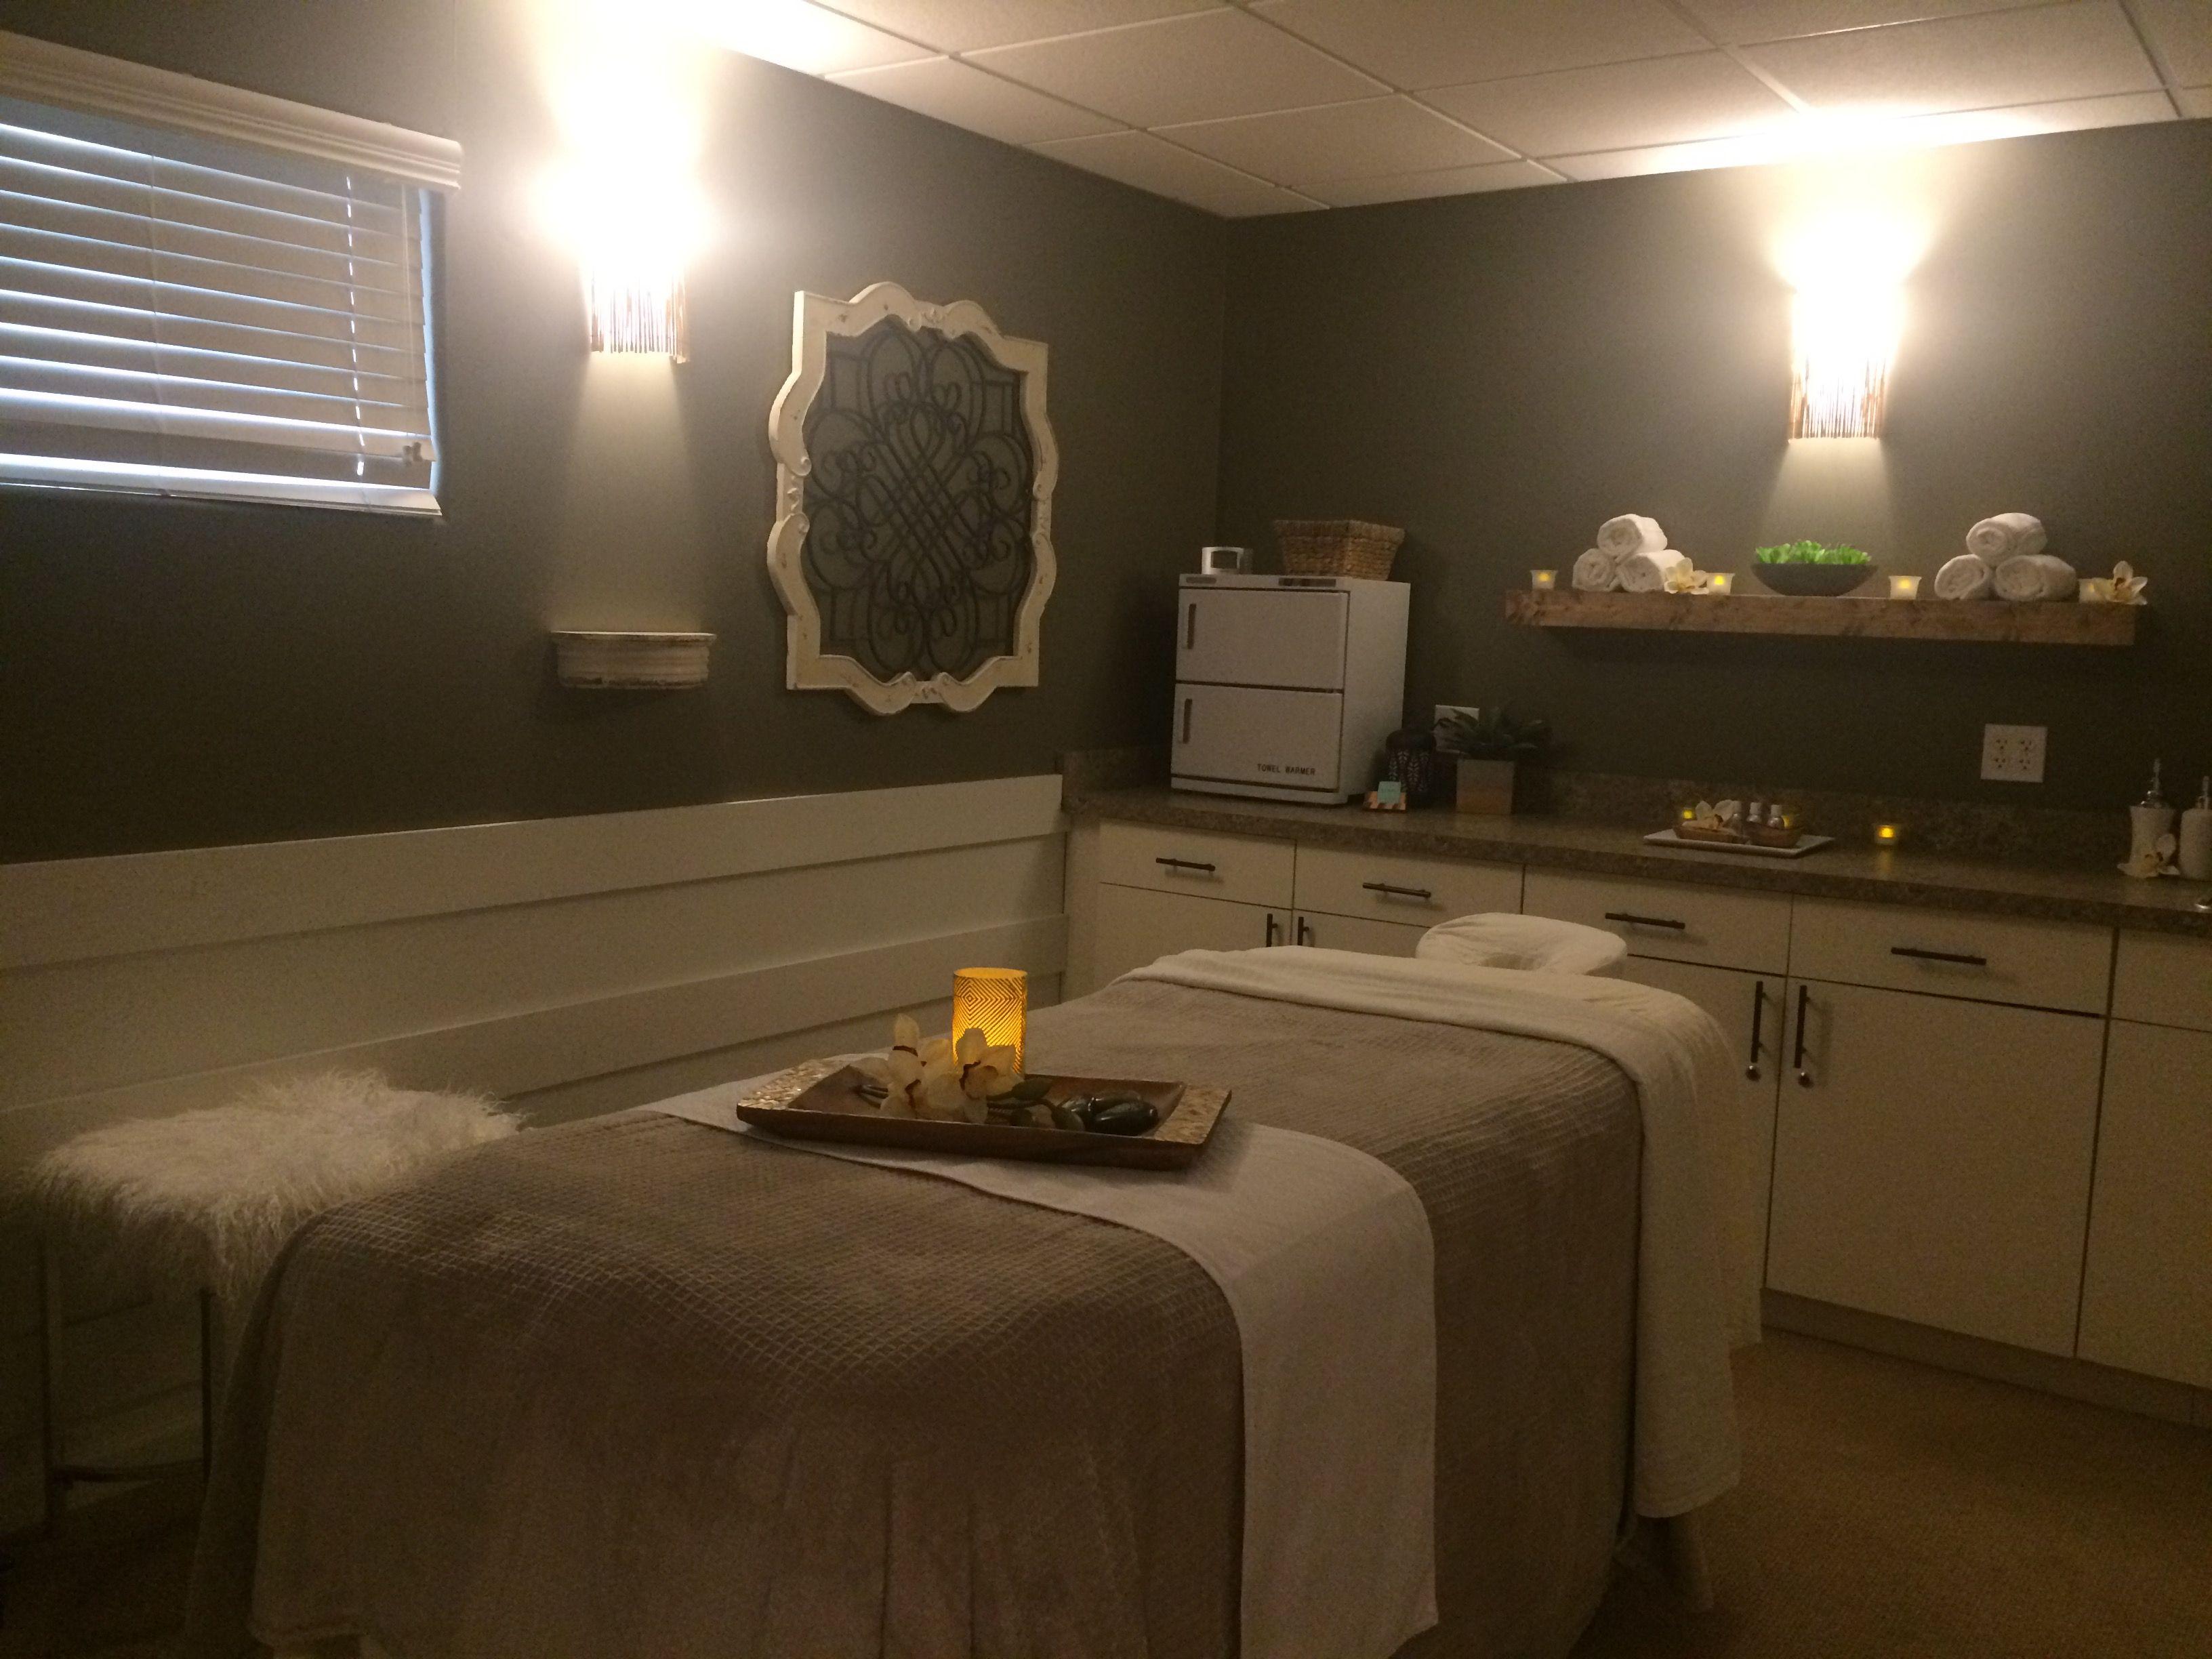 Avanti Salon And Spa Of Clarkston Mi Massage Room Renovation By Gigilinninteriors Massage Room Decor Massage Room Design Massage Room